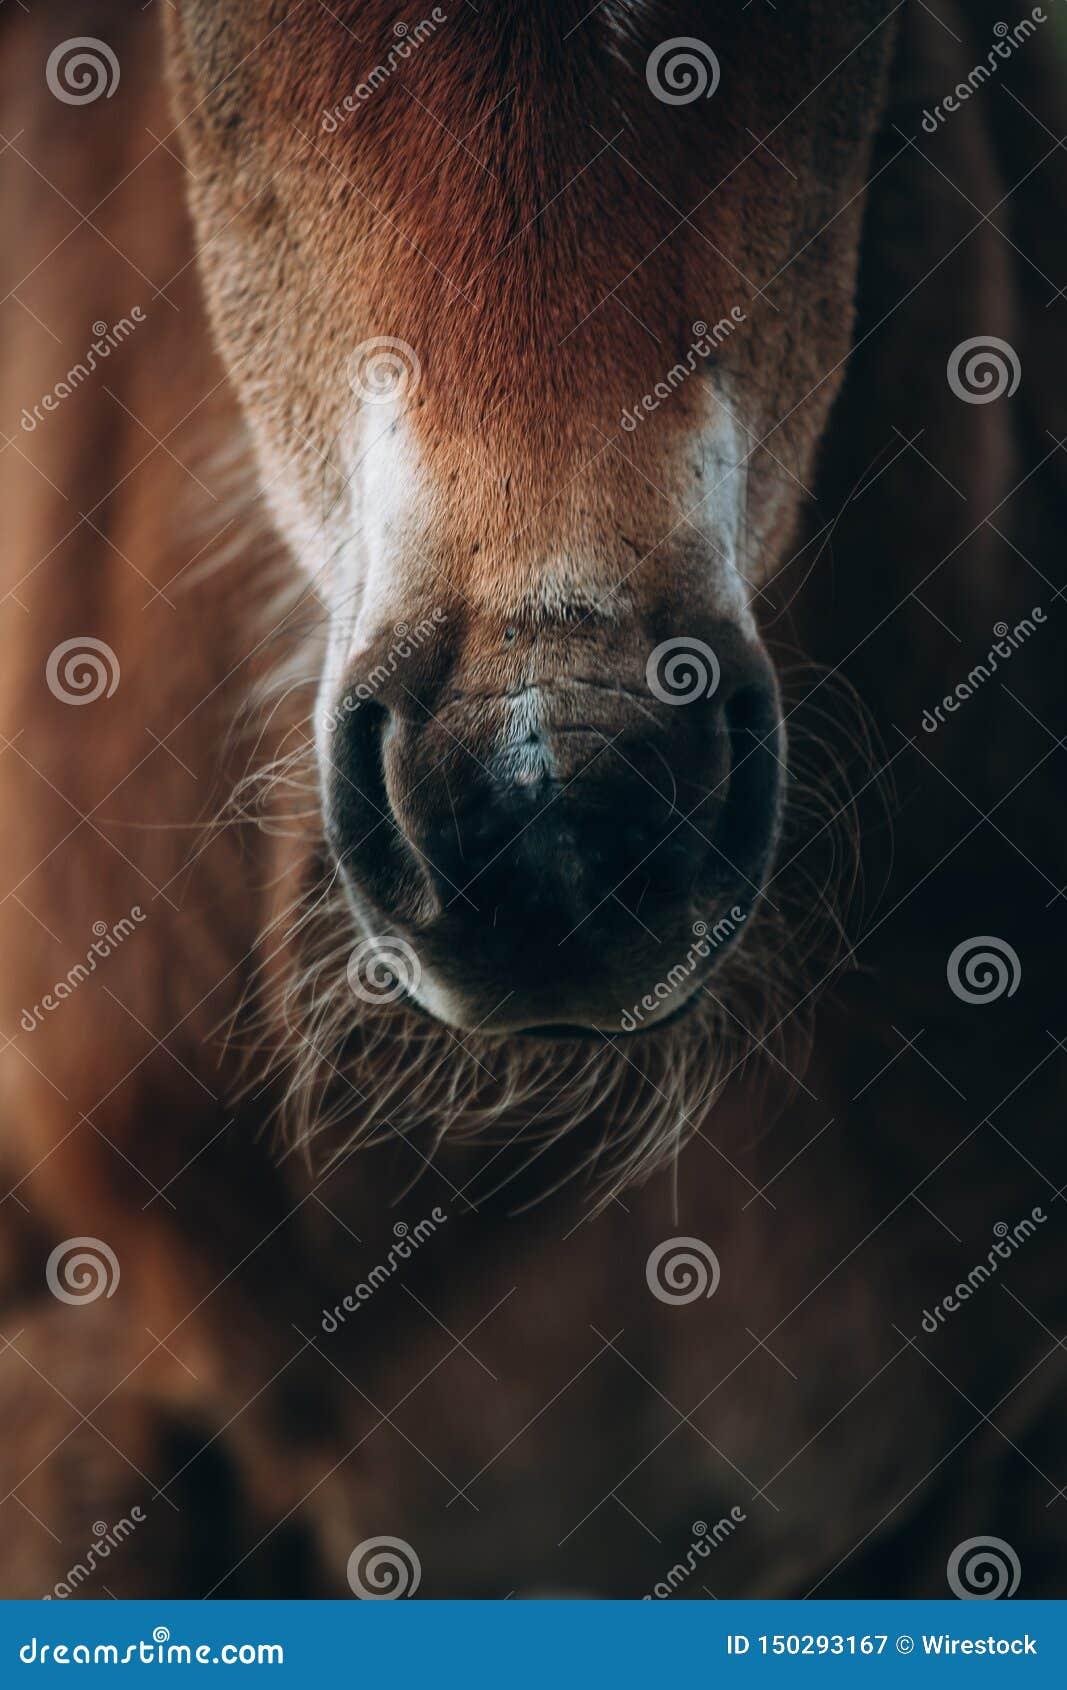 Beautiful closeup shot of a brown horse